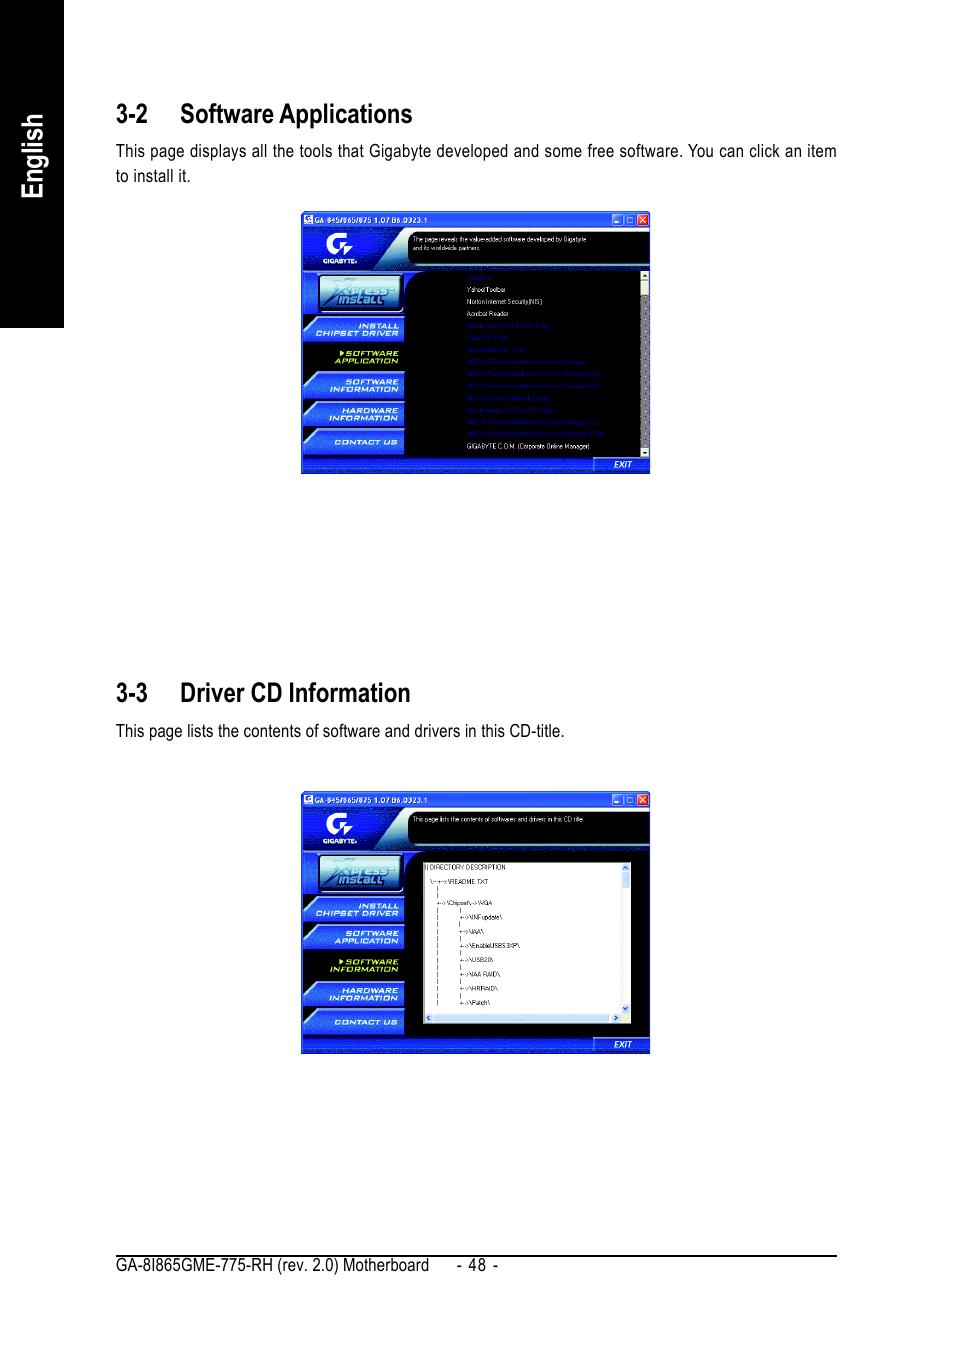 Ga-8i865gme-775-rh bios data error debug code 0d0b 0d01 00c1.